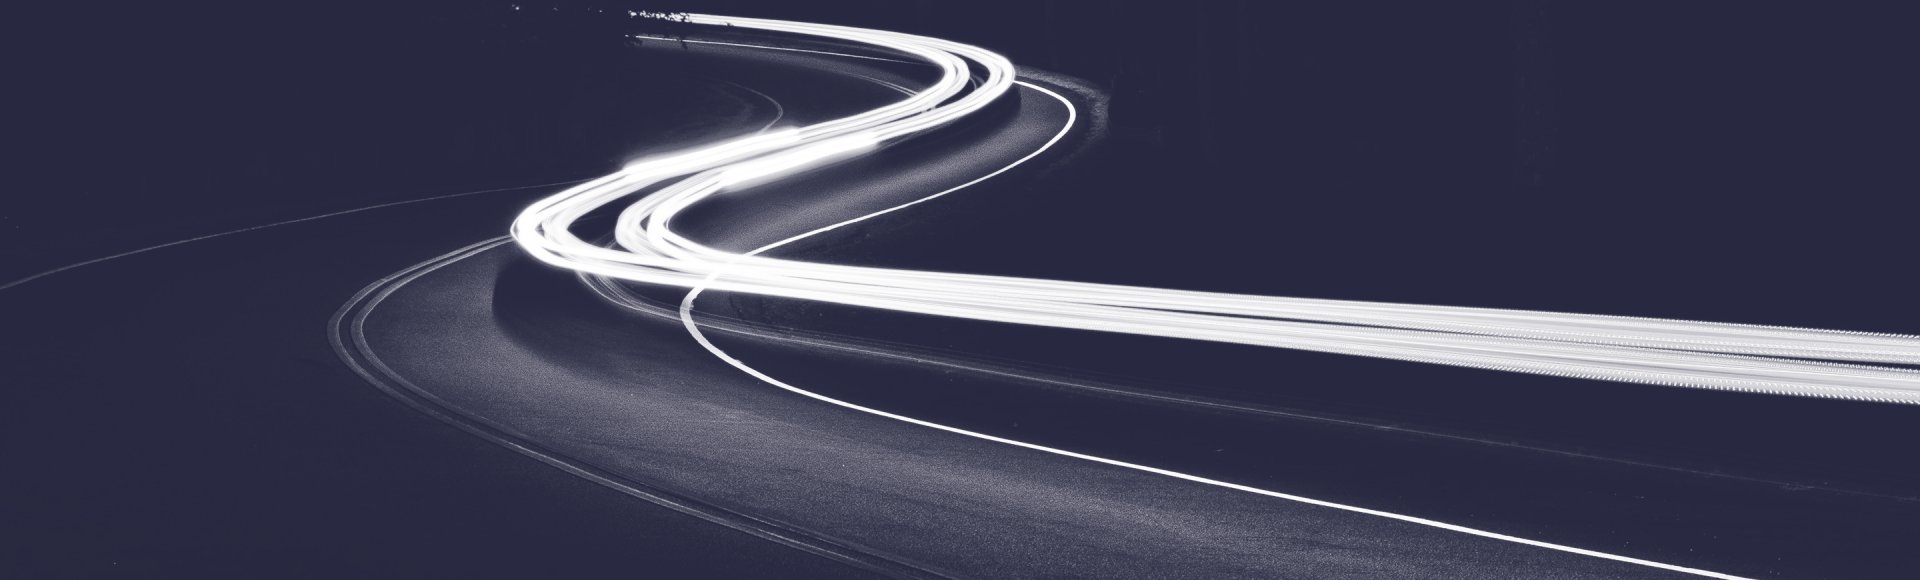 ARK-Invest_Blog-Banner_2019_05_08---Auto-Insurers